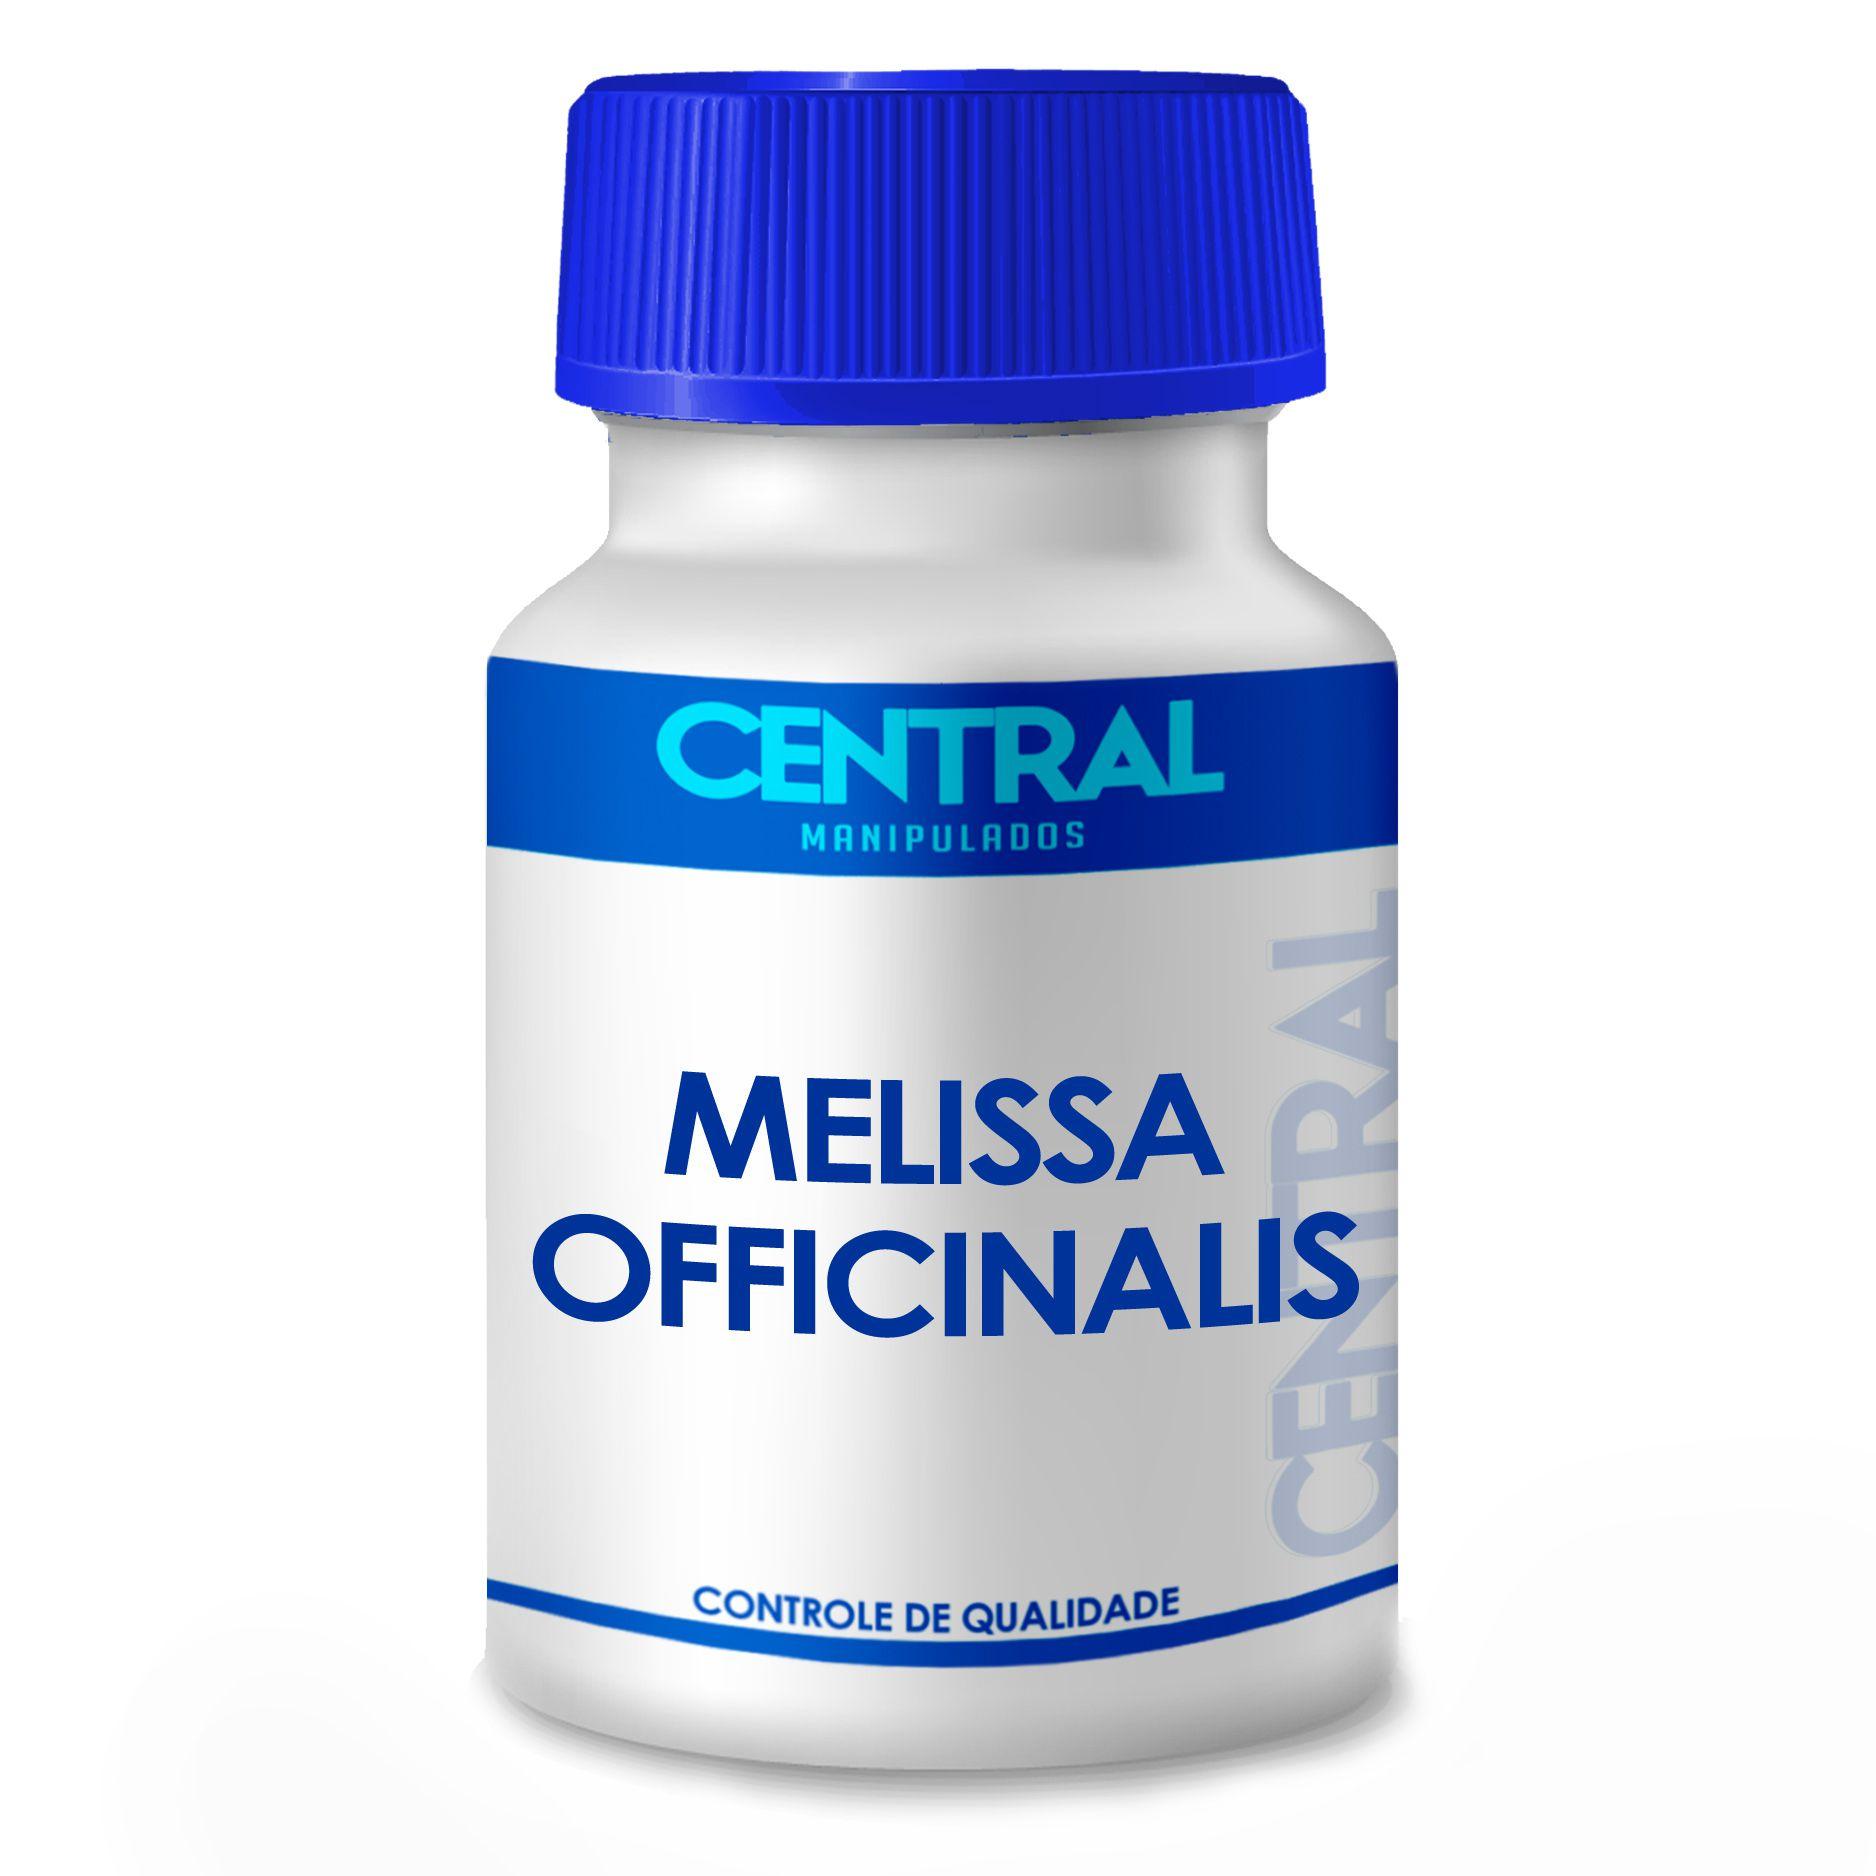 Melissa officinalis 500mg 90 cápsulas